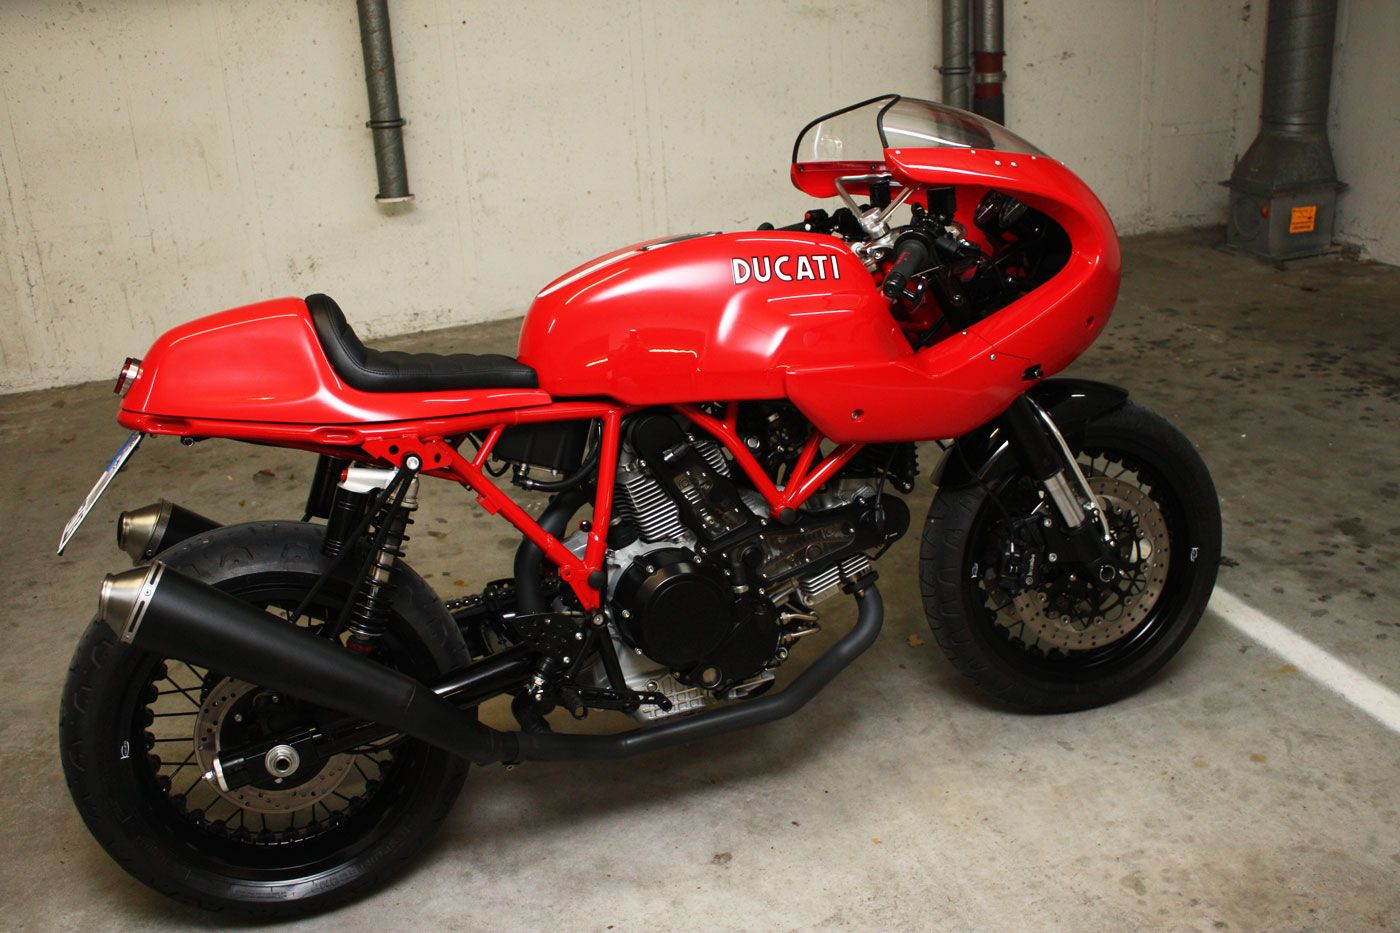 Ducati Sport 1000s Caferacer | triumphbikes.de | BMW • Ducati • KTM • Triumph • Buell • Yamaha • Honda • Malaguti